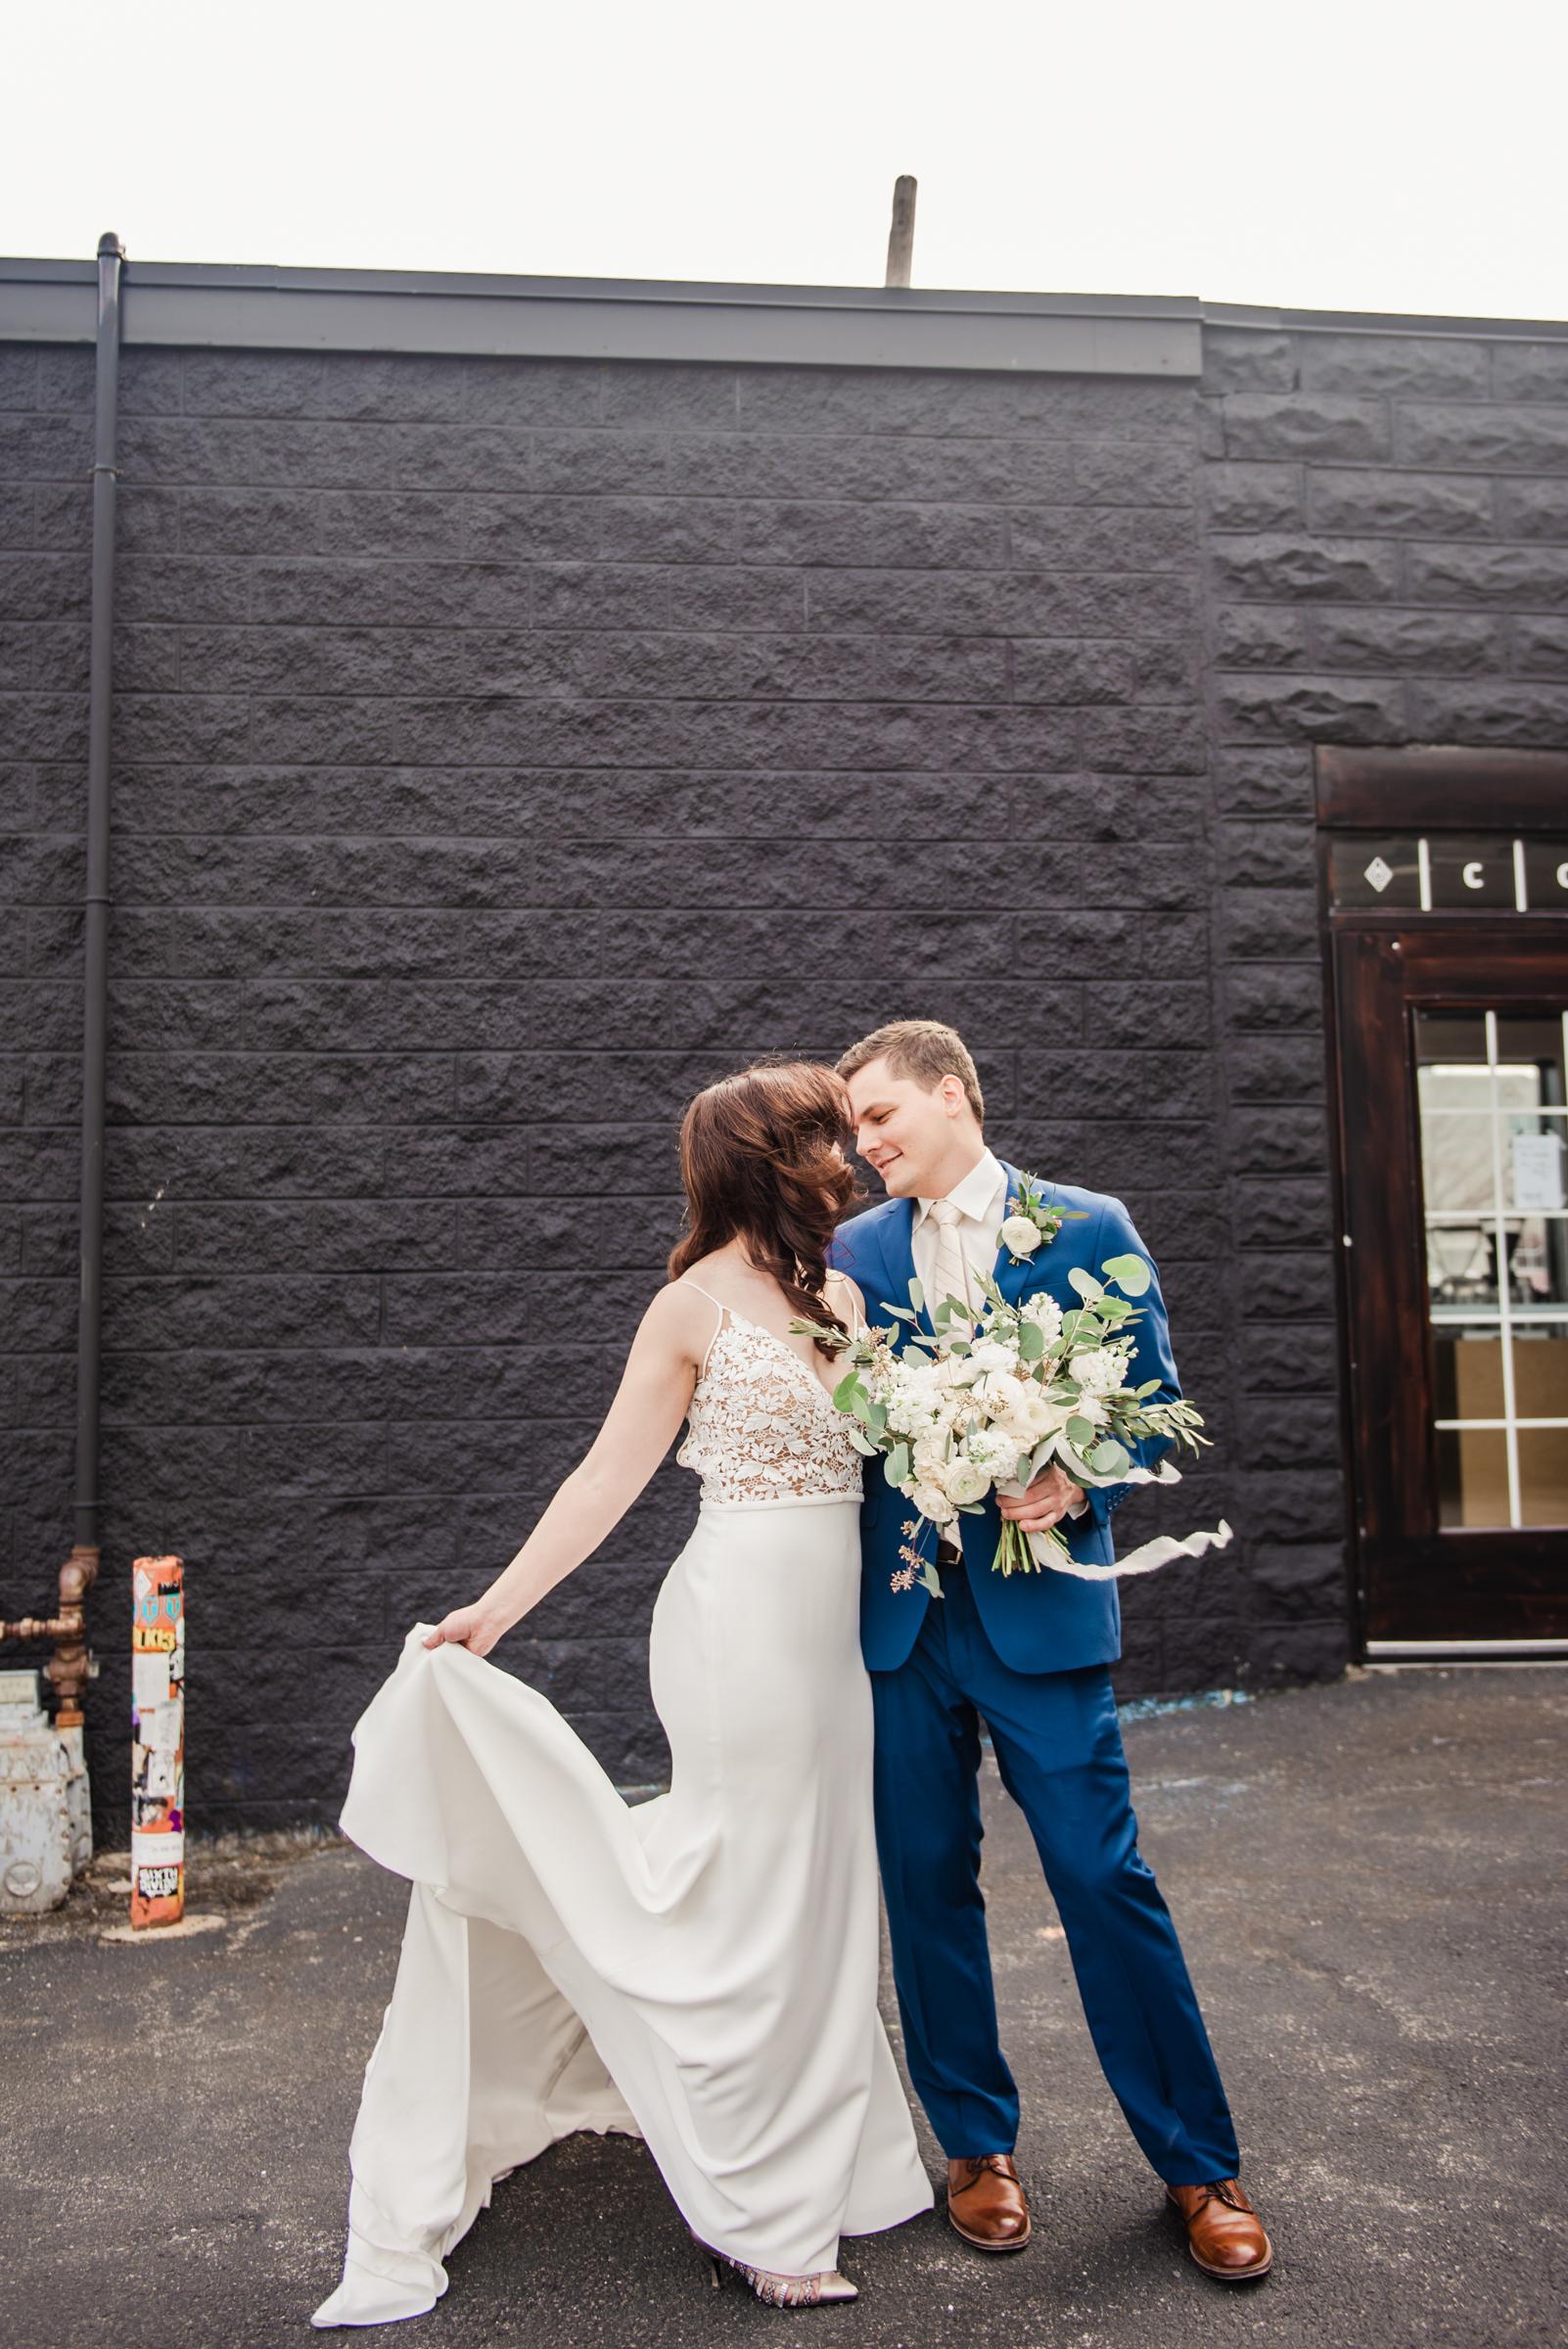 The_Arbor_LoftRochester_Wedding_JILL_STUDIO_Rochester_NY_Photographer_160446.jpg